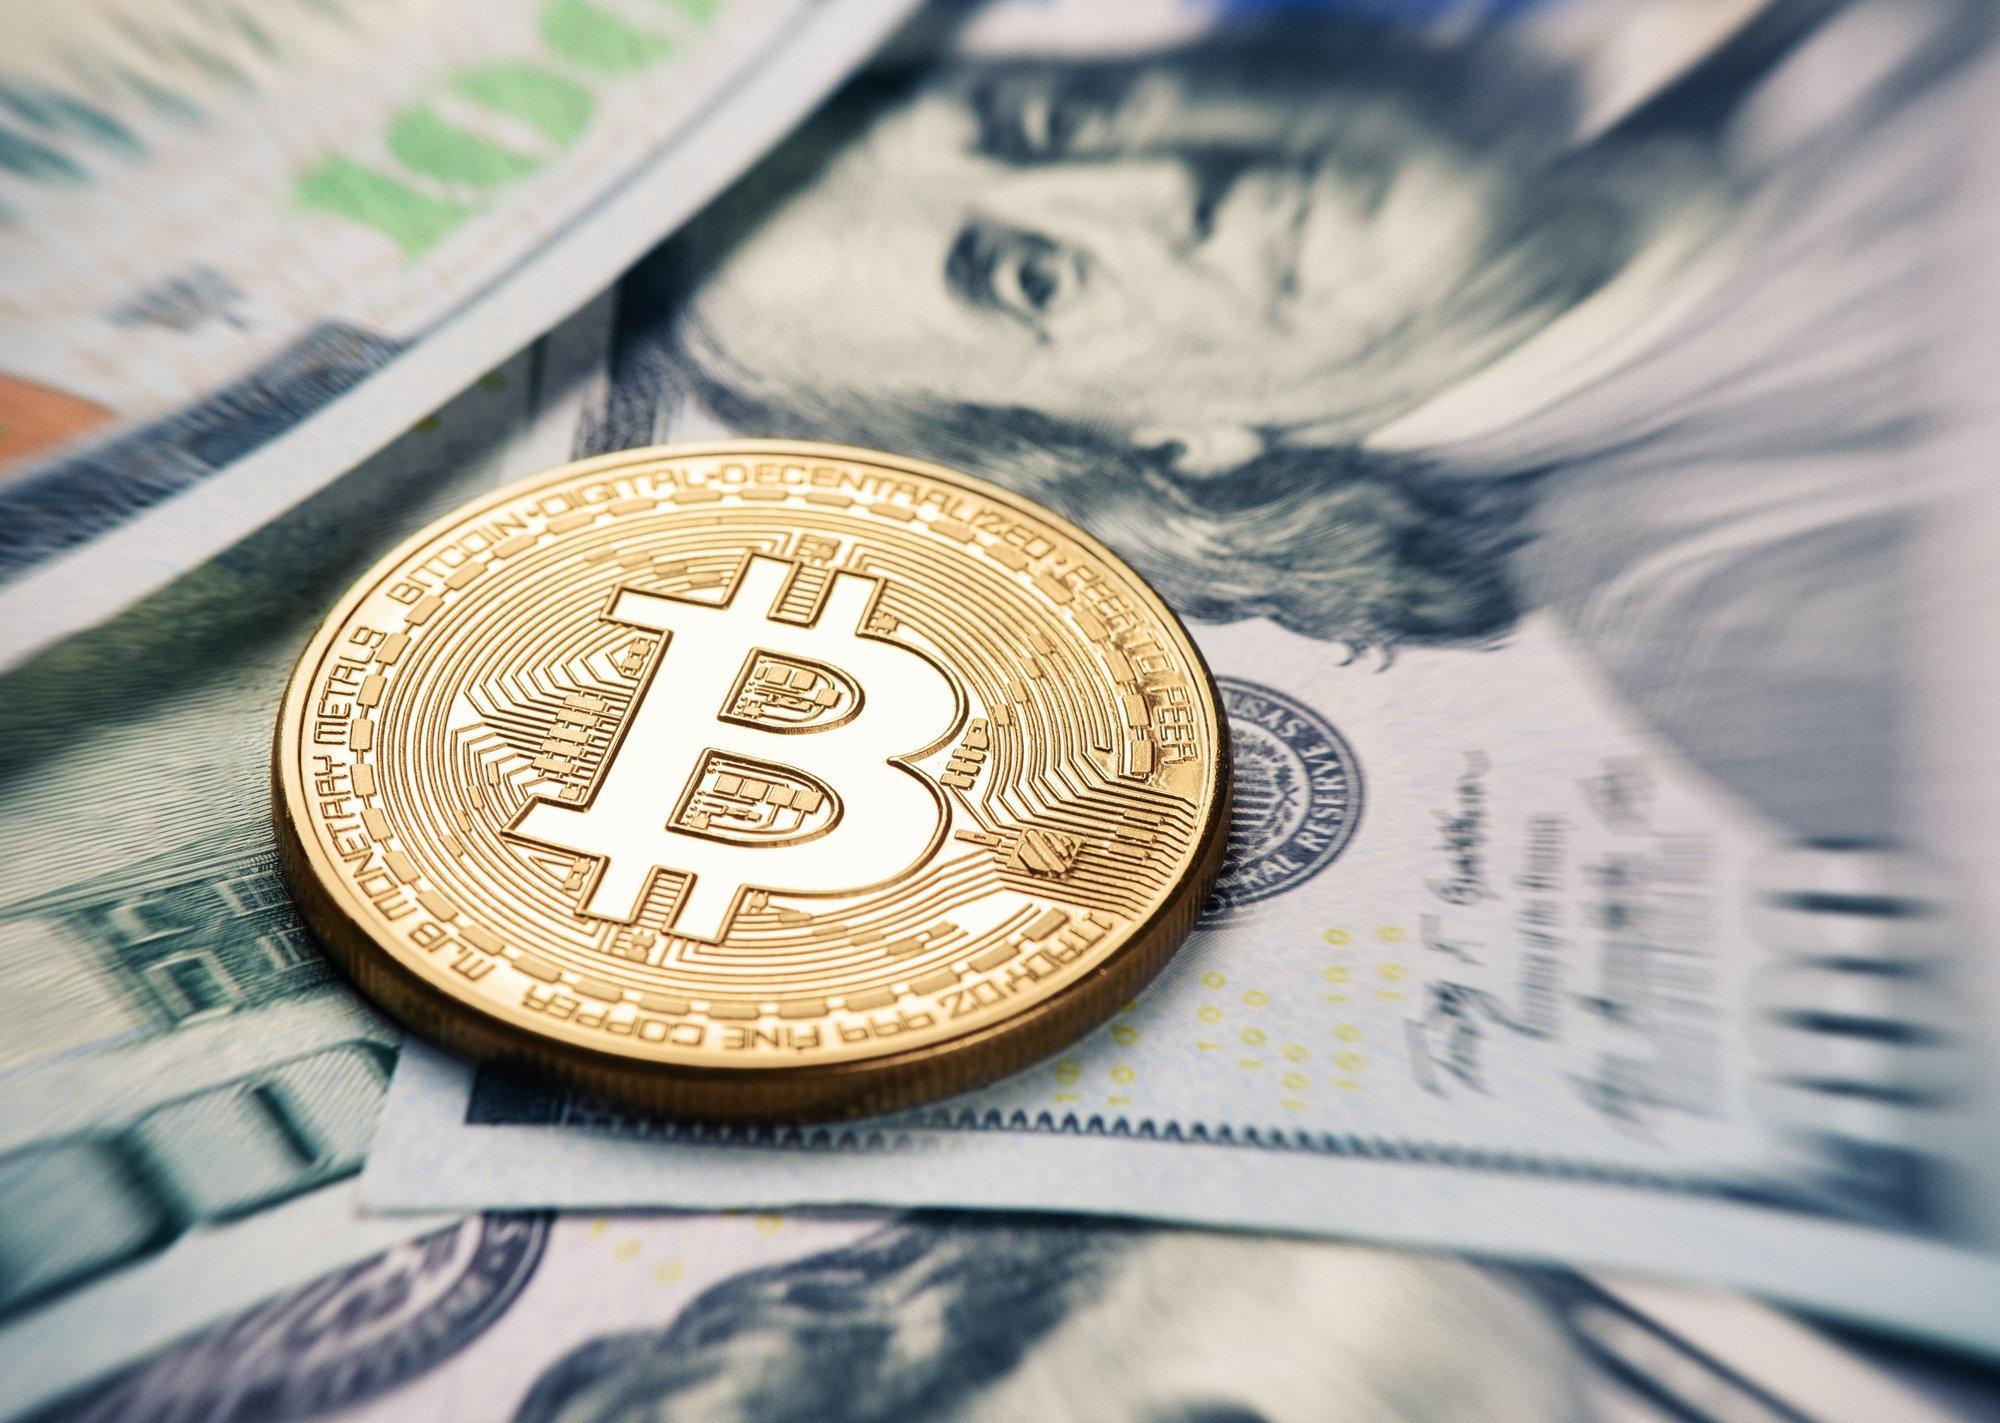 دلار ، طلا و بیت کوین ، افزایش شاخص دلار کاهش قیمت بیت کوین